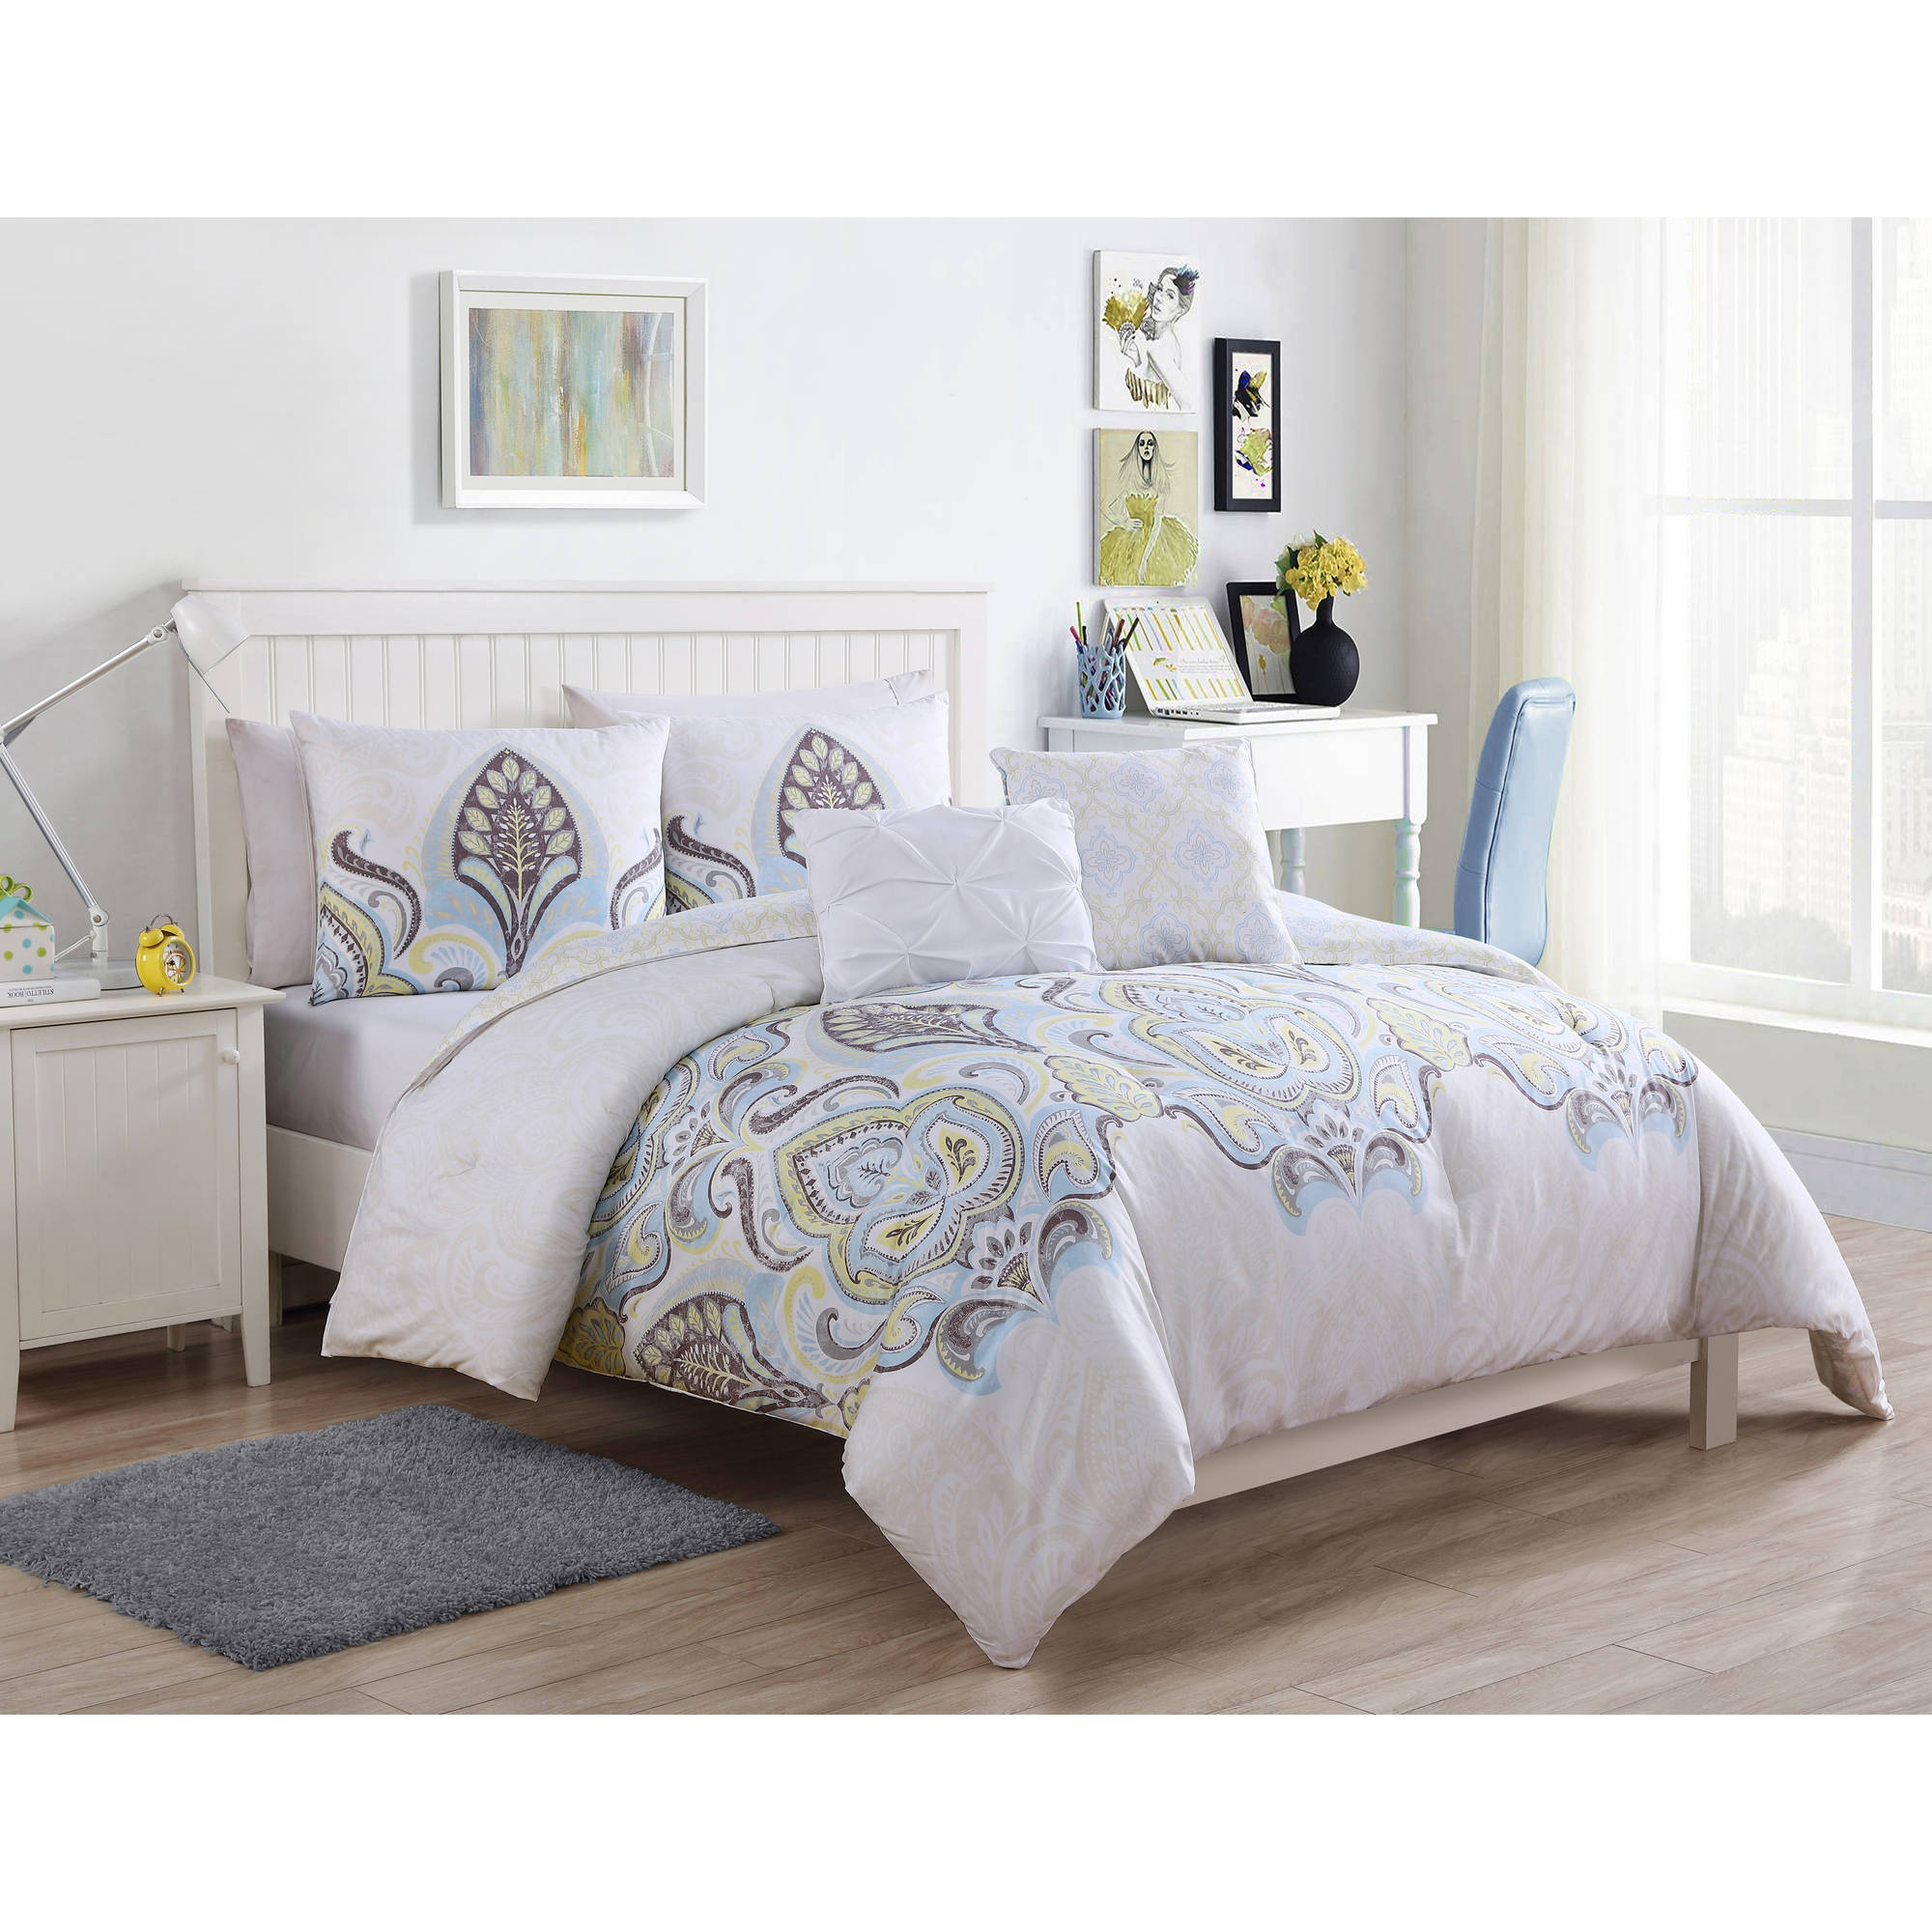 VCNY Home Multi-Color Shazia 4/5 Piece Bedding Comforter Set, Decorative Pillows Included